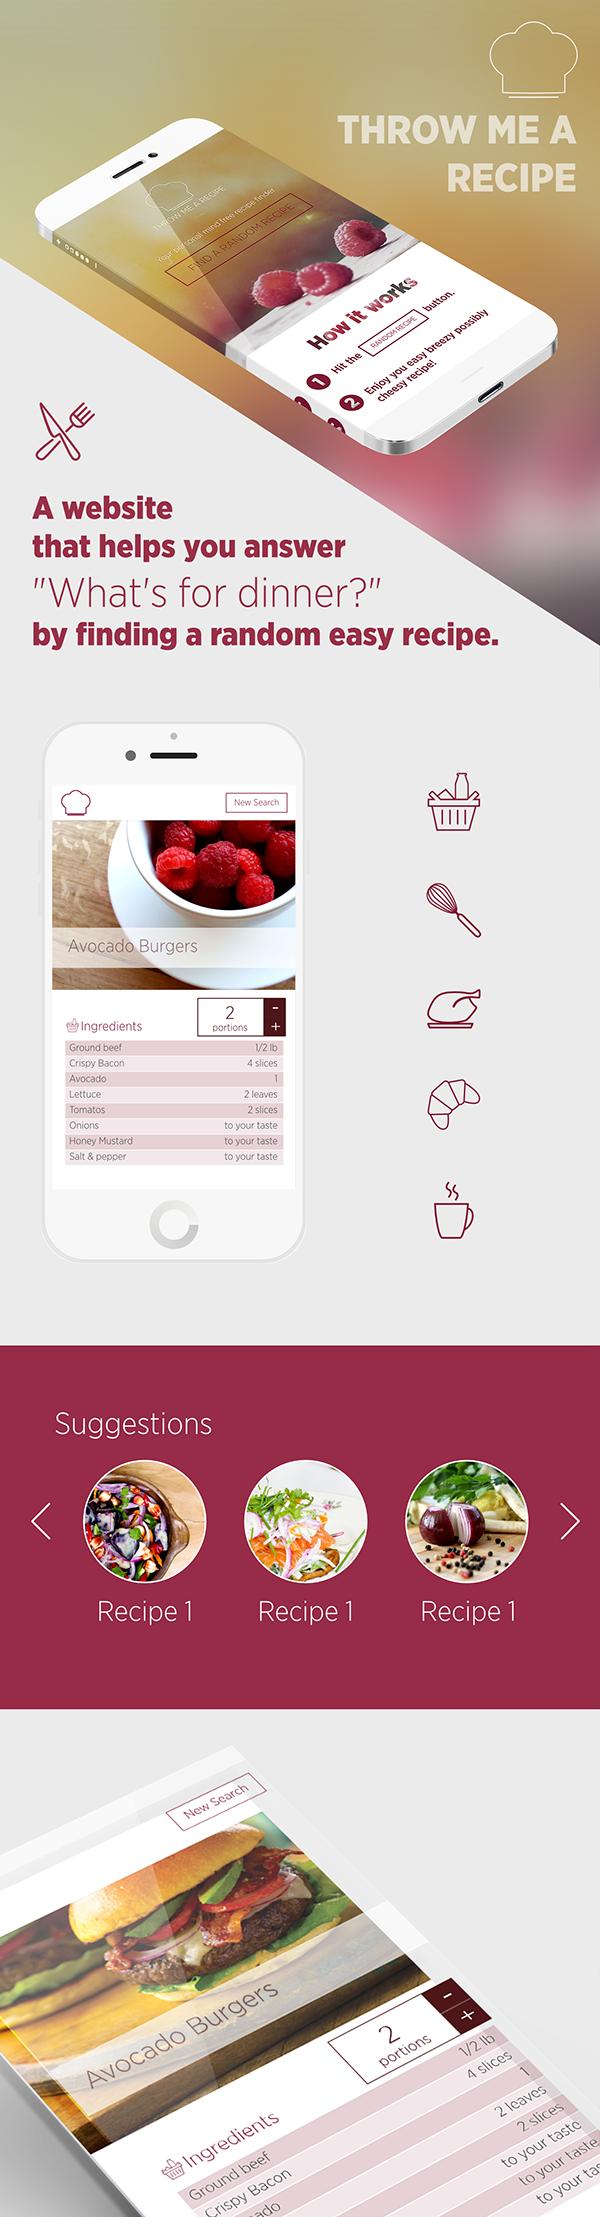 recipe UI icons Web design Food  cooking app iphone web app